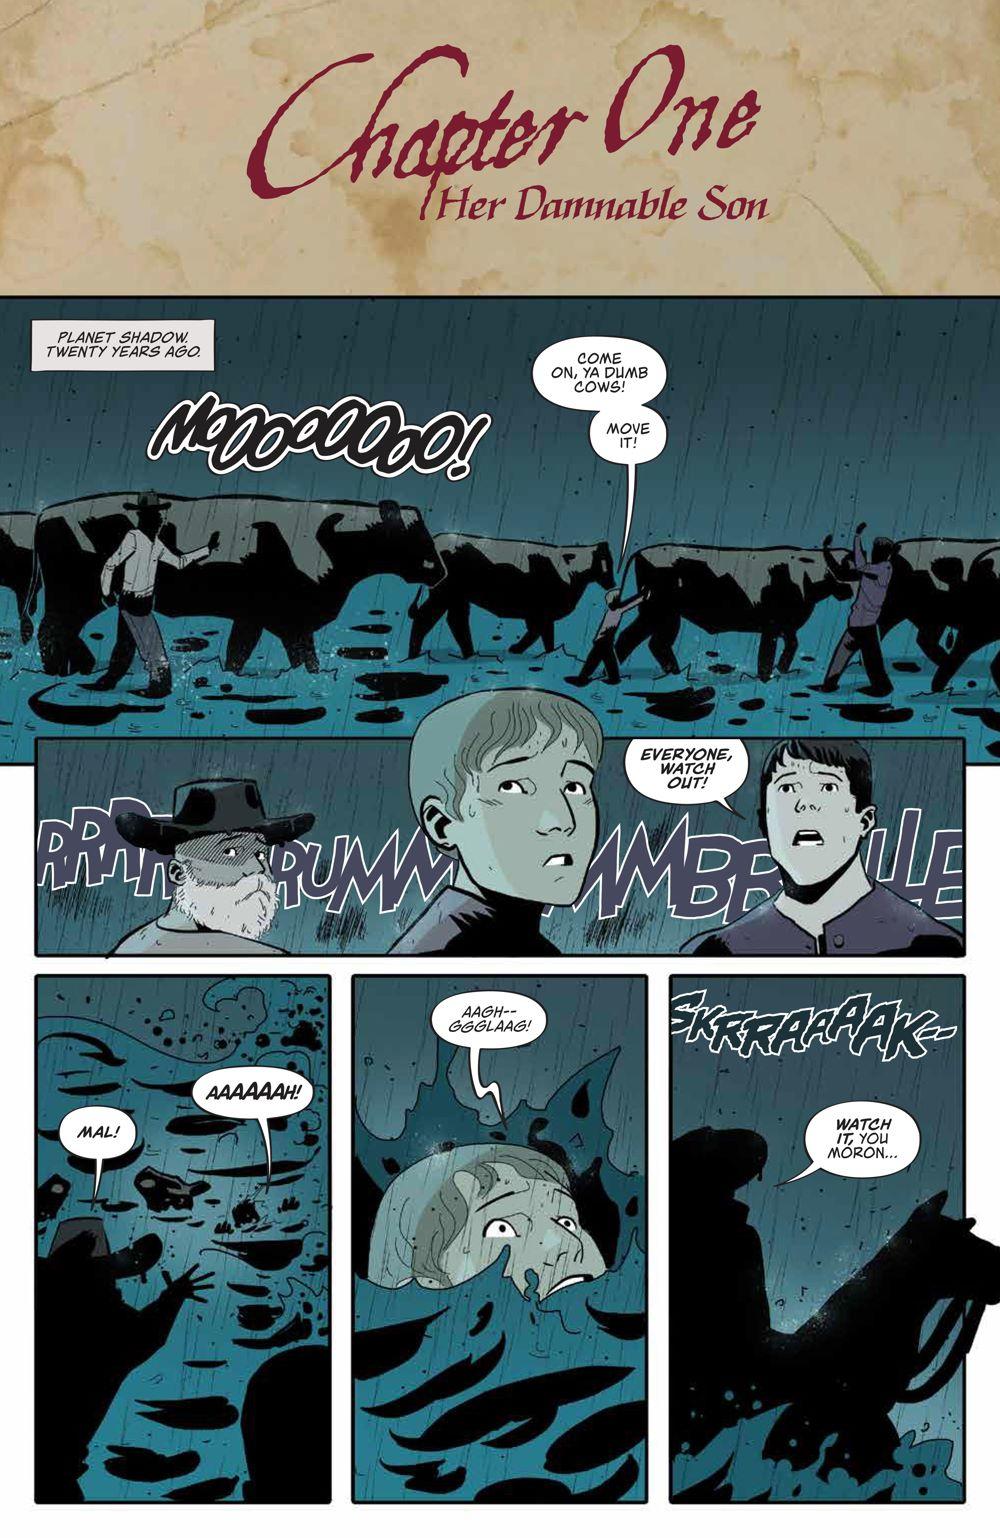 Firefly_NewSheriffVerse_v1_HC_PRESS_11 ComicList Previews: FIREFLY NEW SHERIFF IN THE 'VERSE VOLUME 1 HC